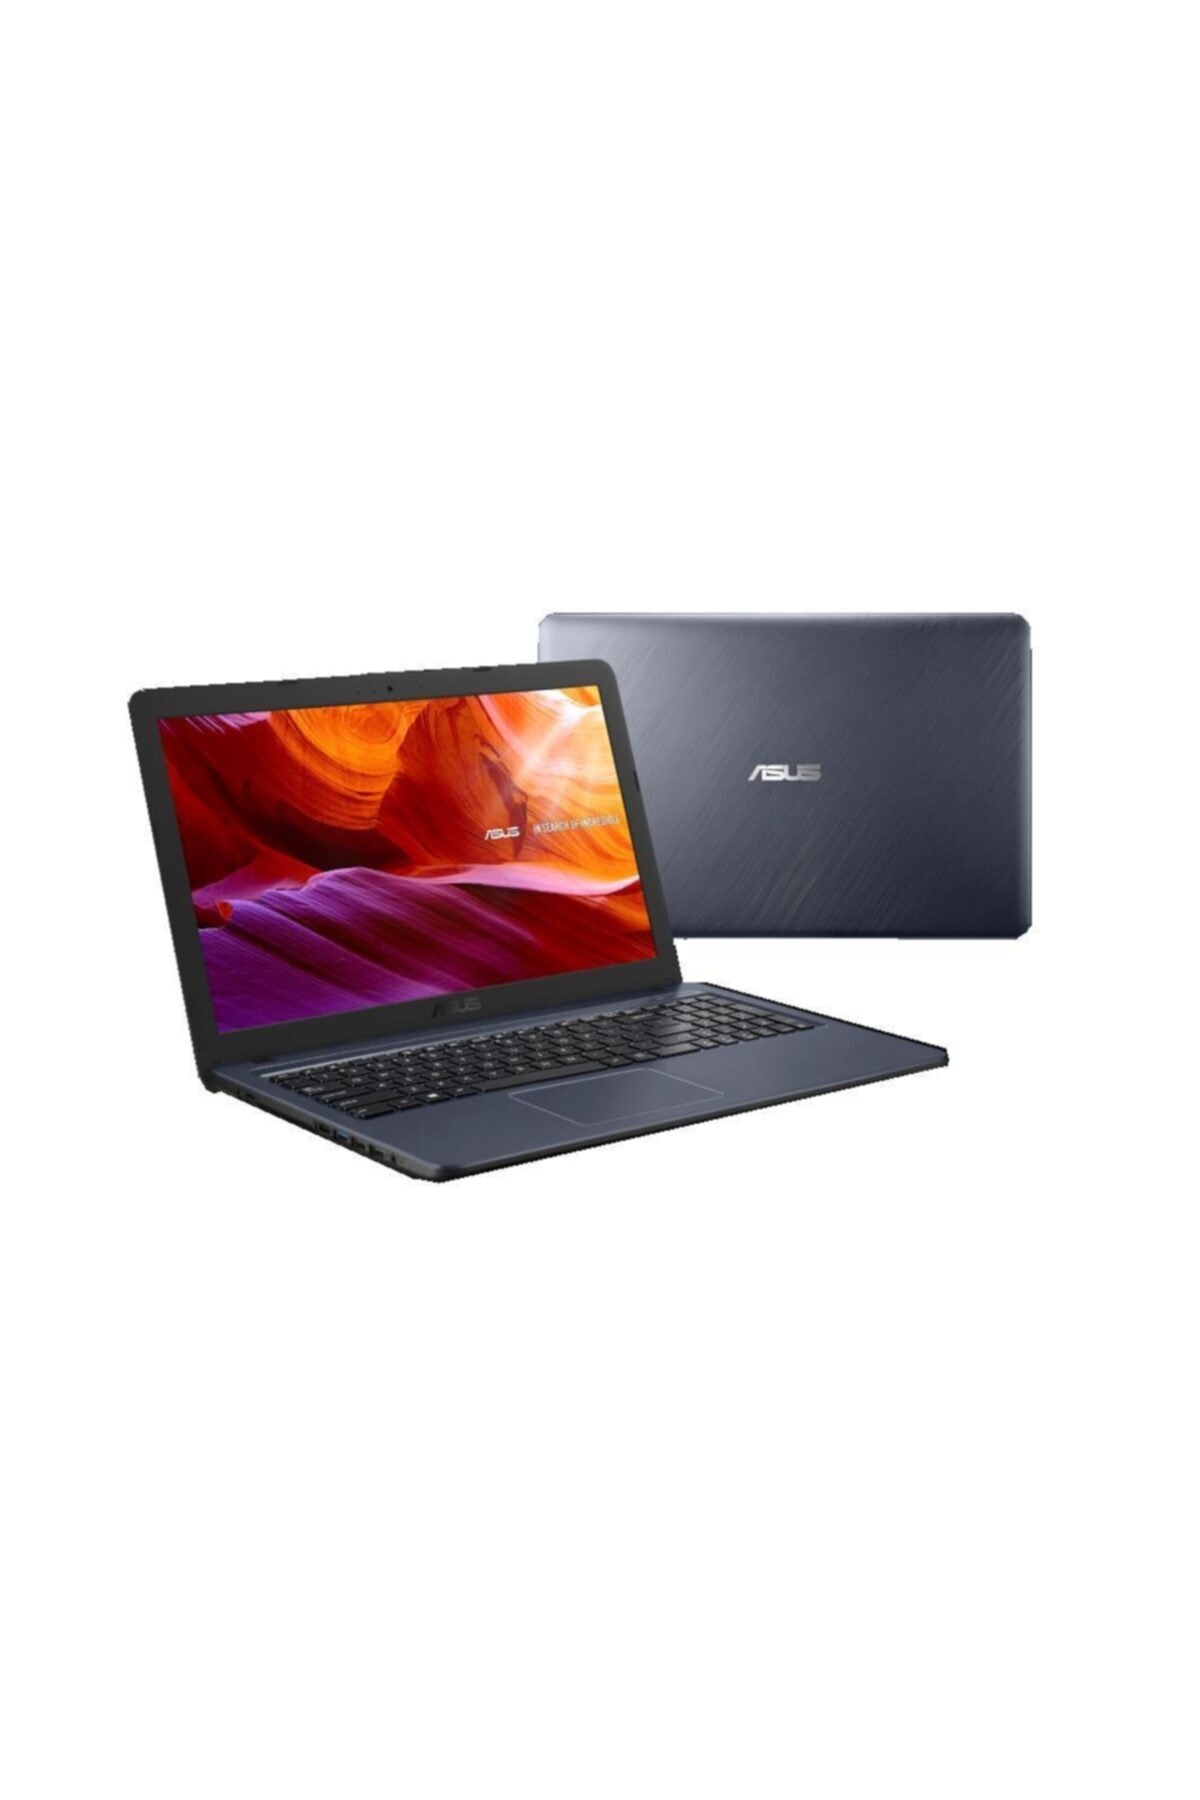 ASUS X543na-gq289 Cel N3350 4g 1tb 15,6 Endless Notebook 1